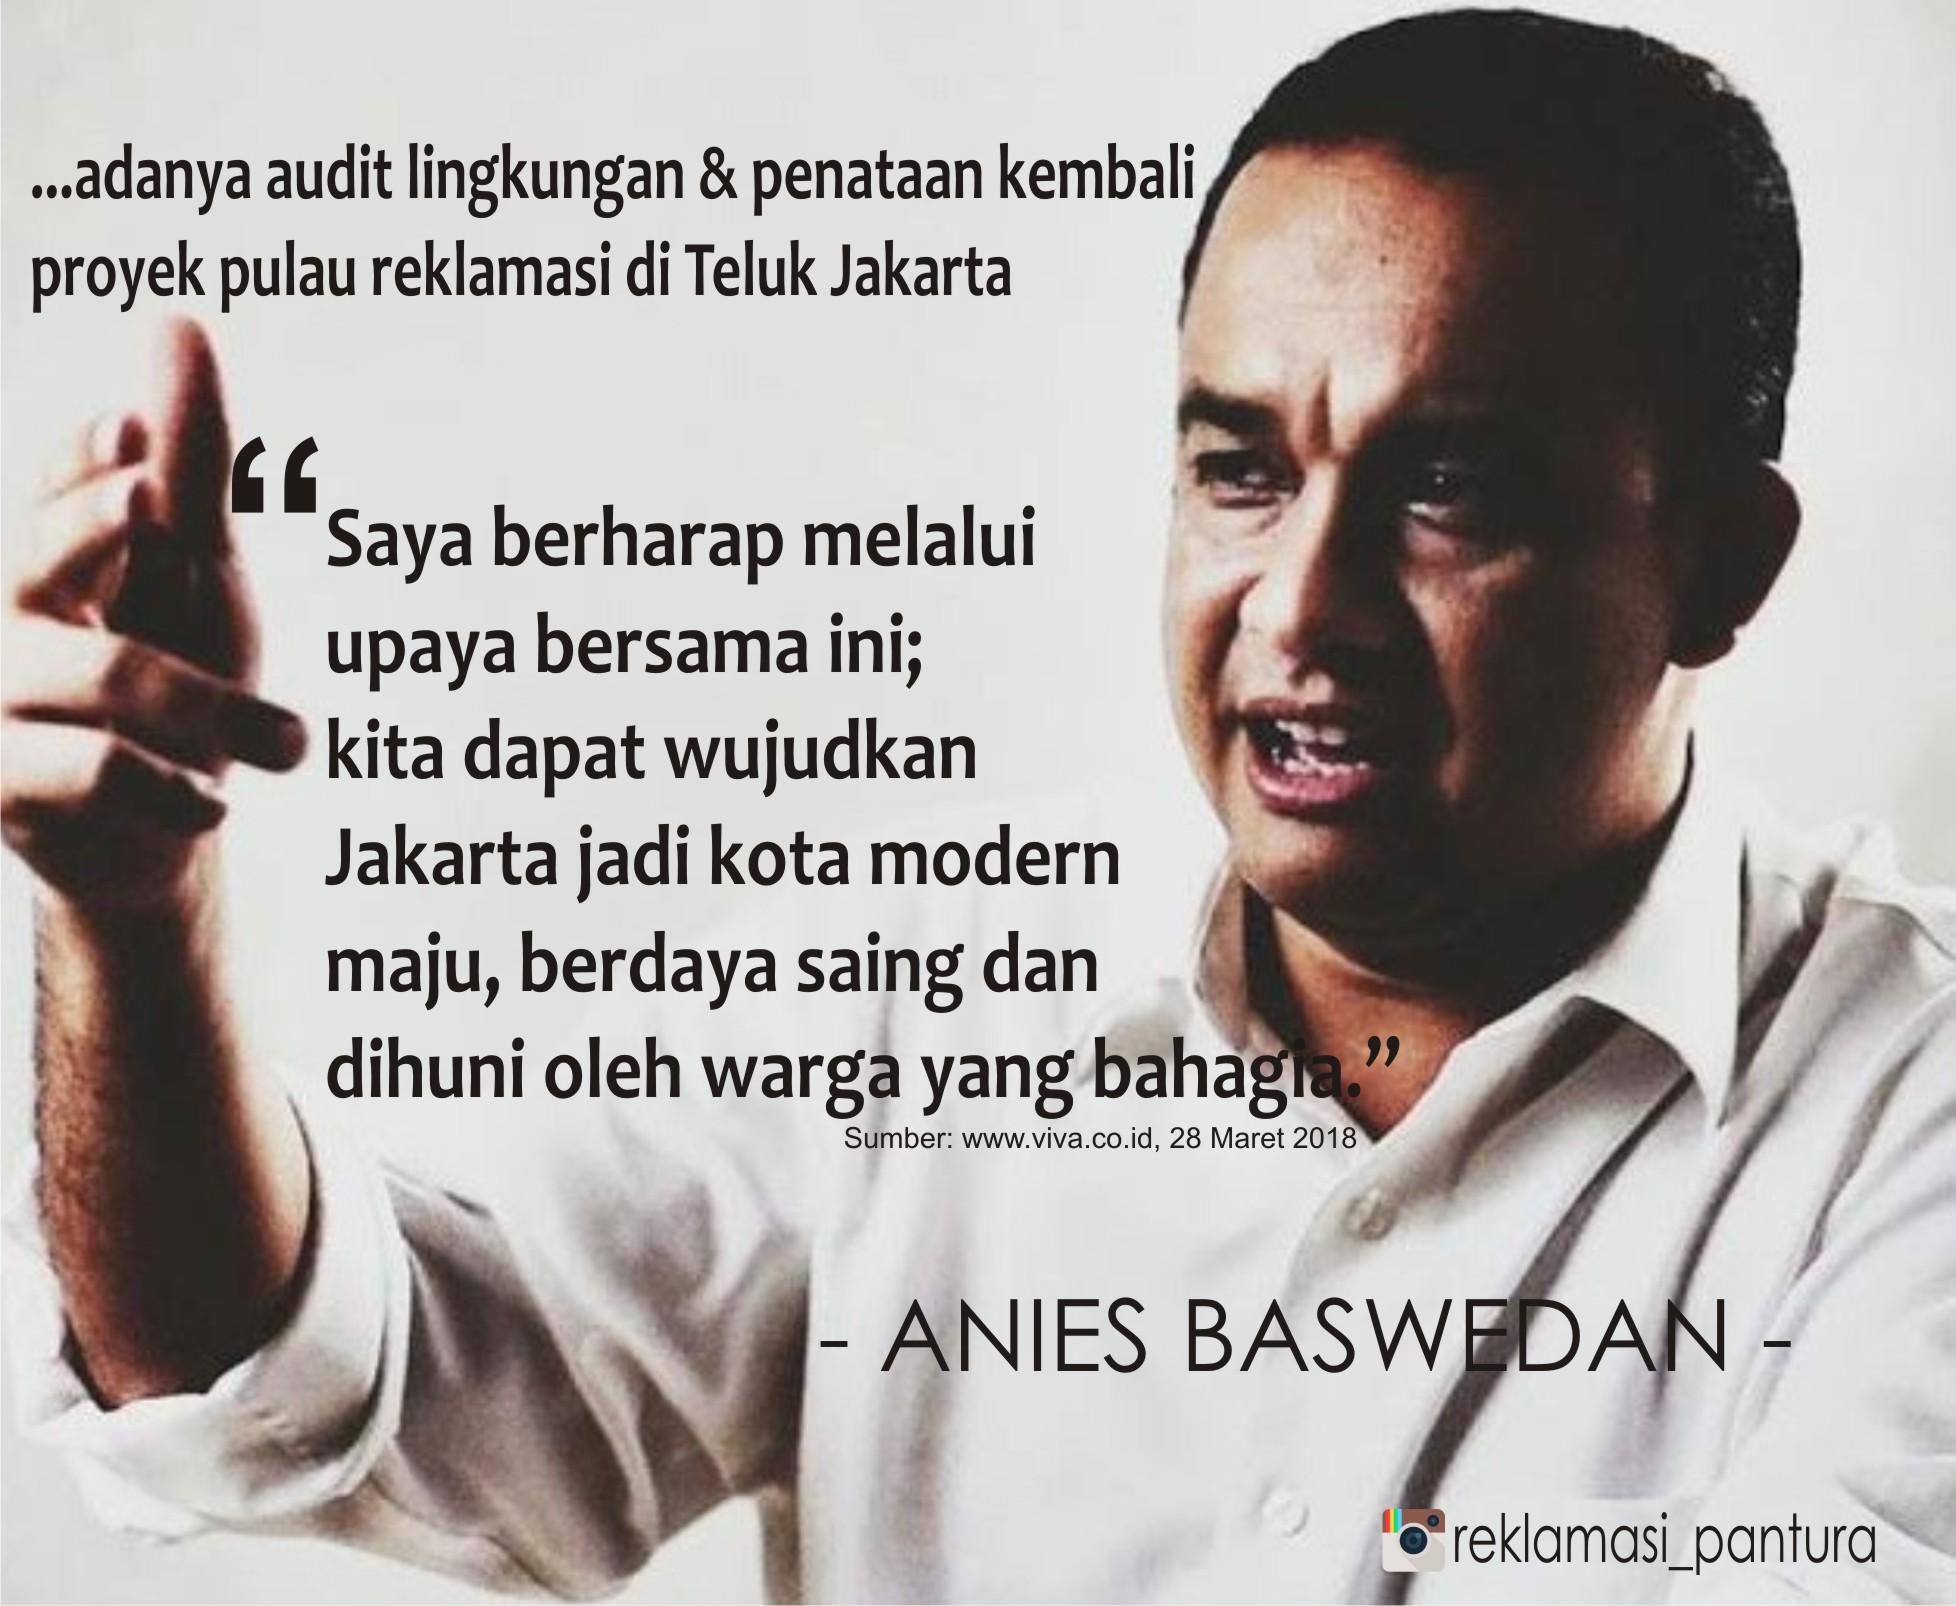 Anies: Tata Ulang Proyek Reklamasi untuk Jakarta lebih Maju dan Sejahtera